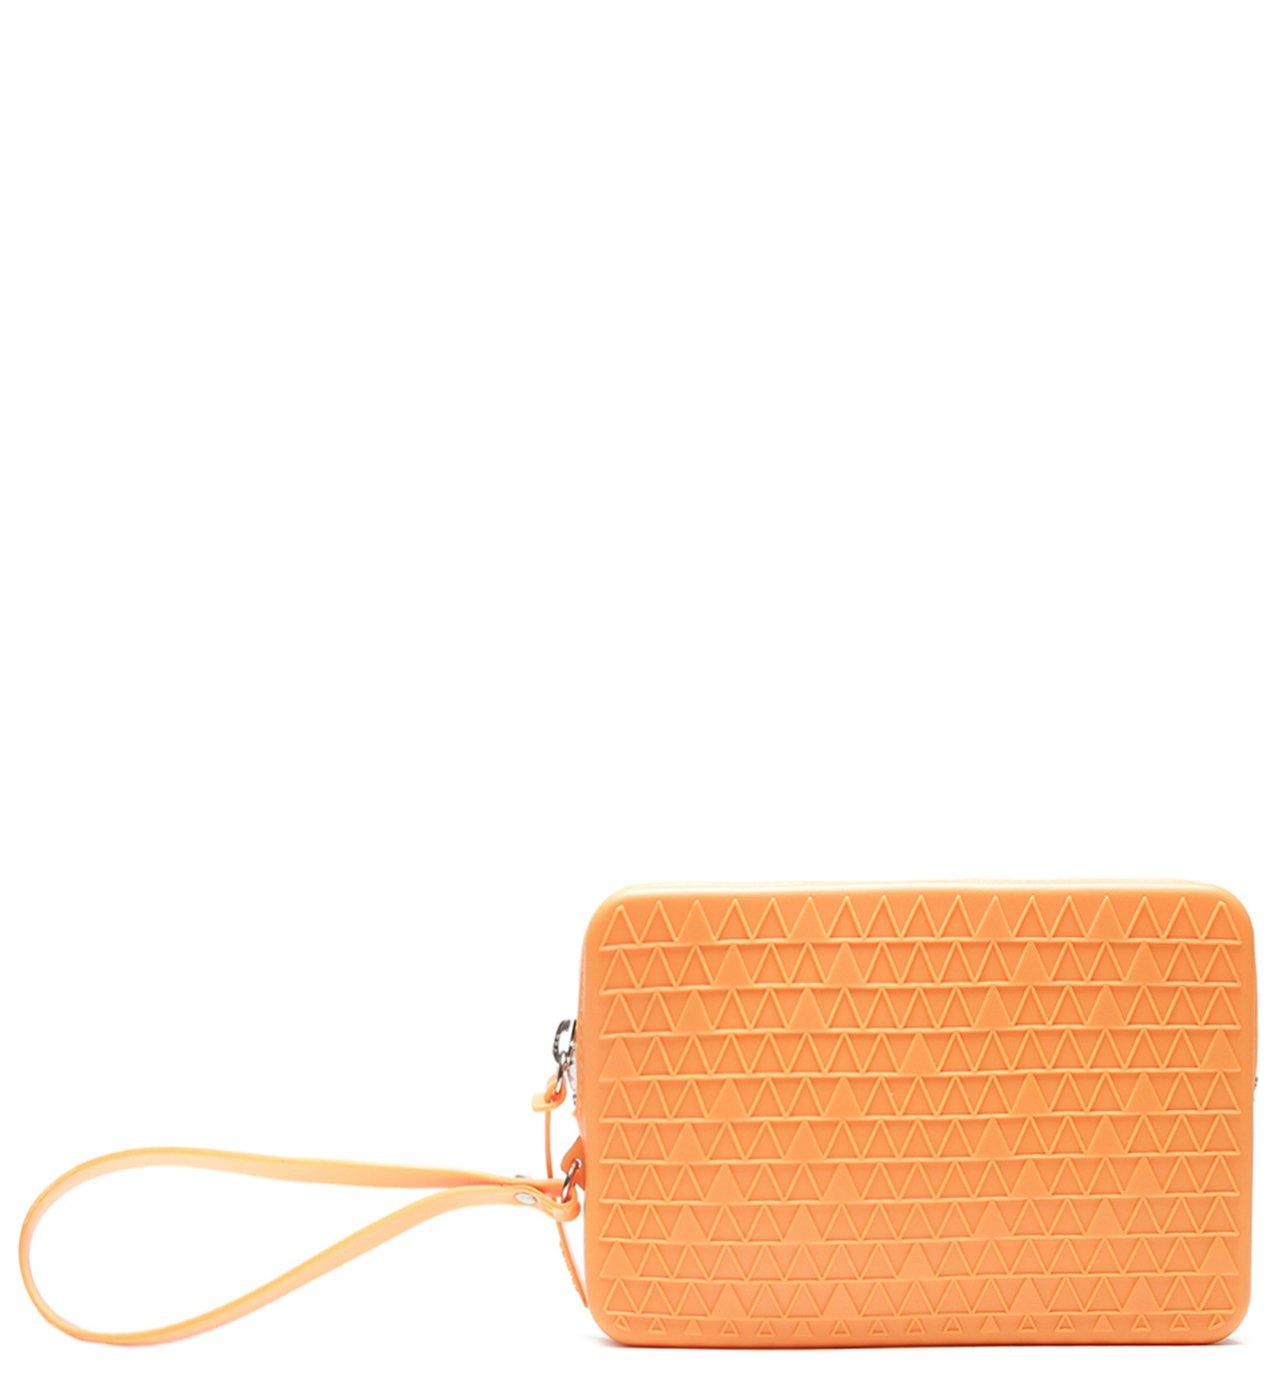 Mini Bag Jelly Tangerine   Schutz